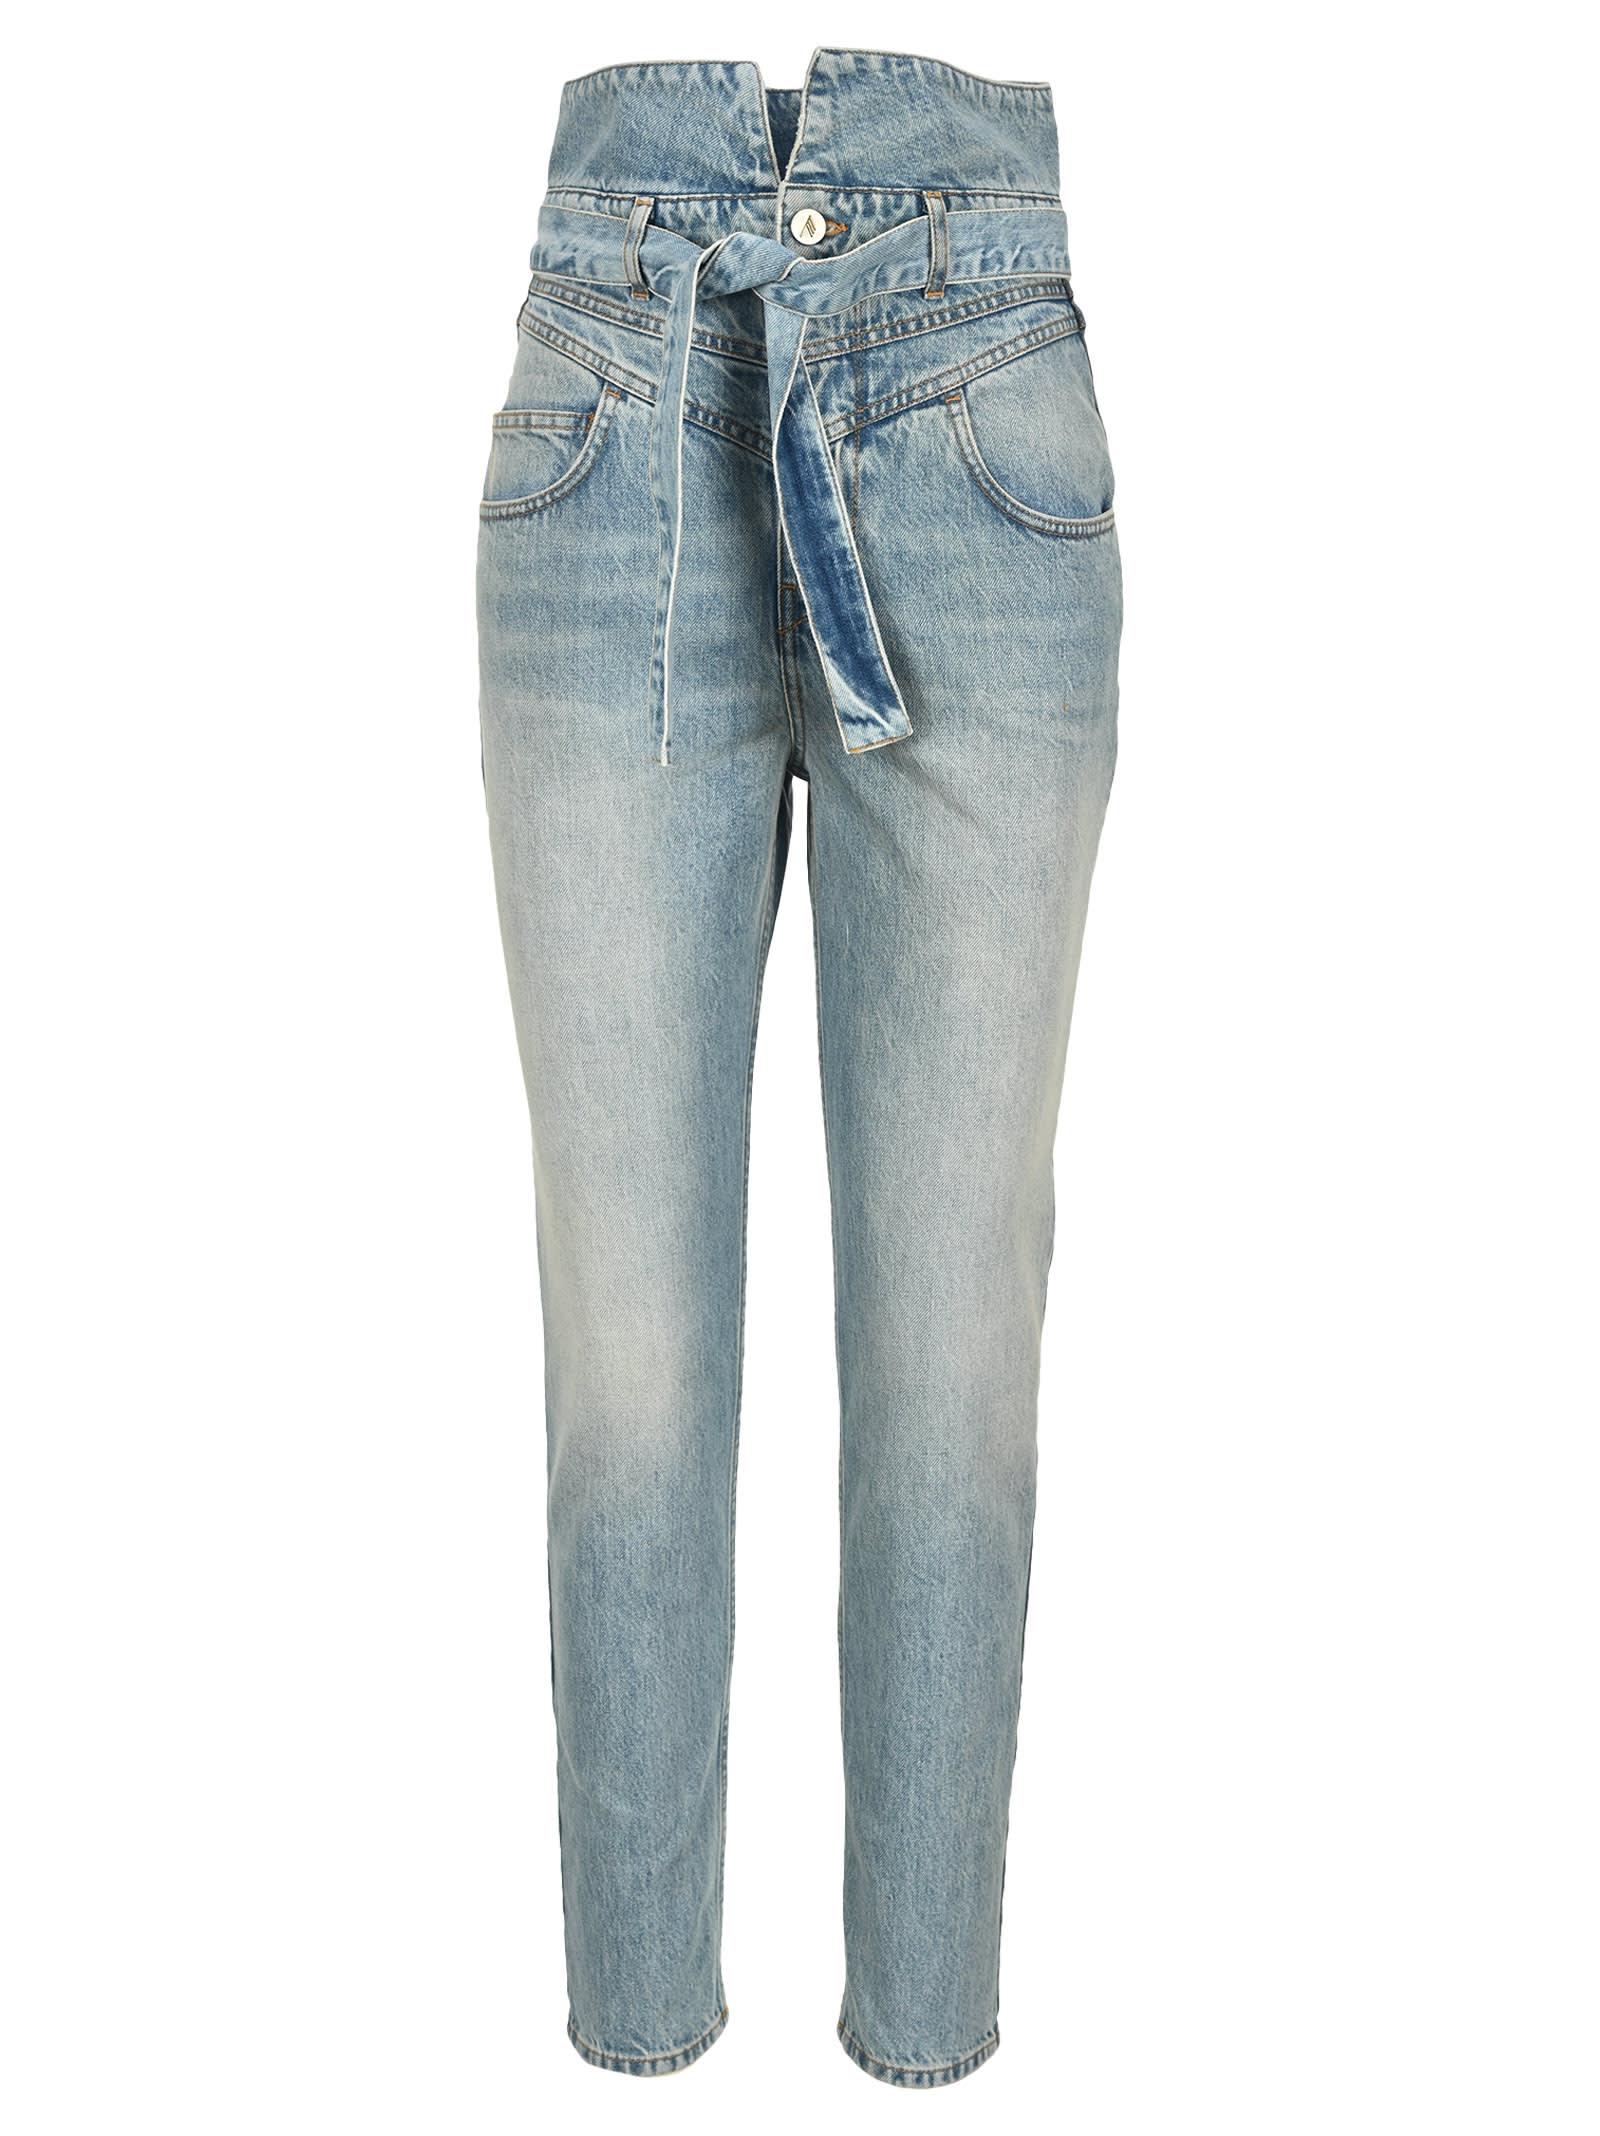 Attico Vivien Washed High-rise Jeans